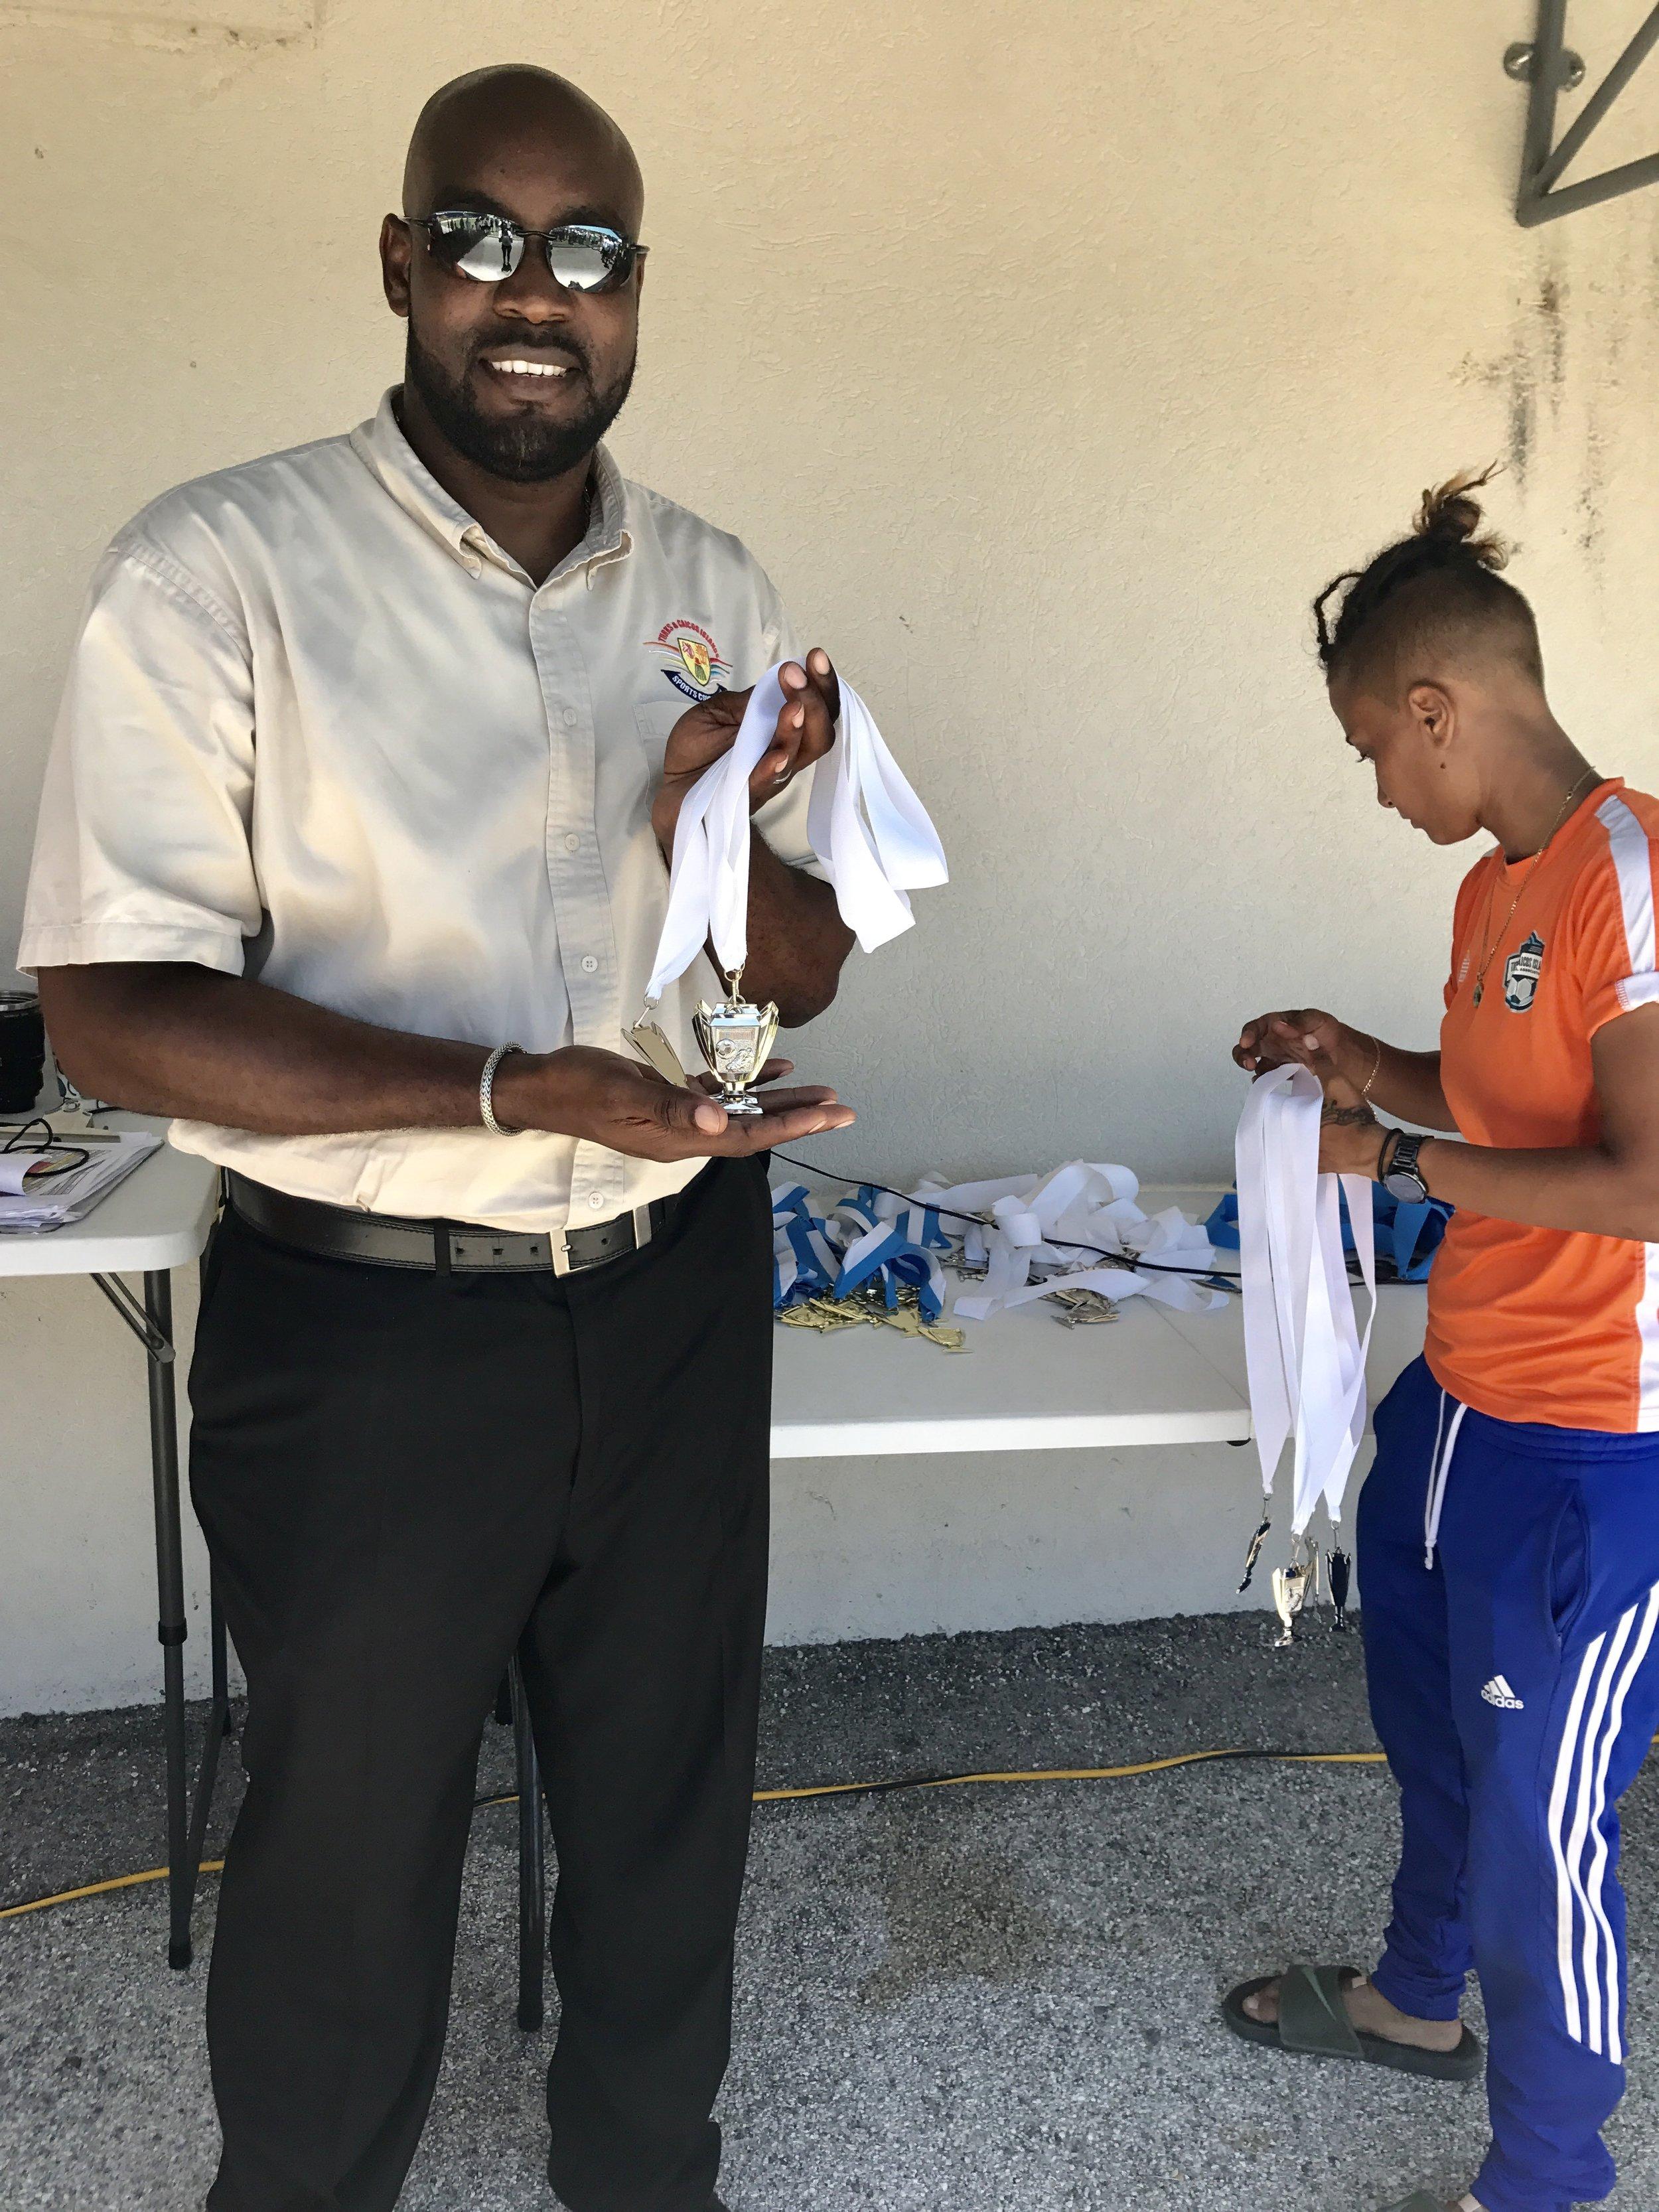 Alvin Parker, Senior Sports Officer of the Turks & Caicos Islands